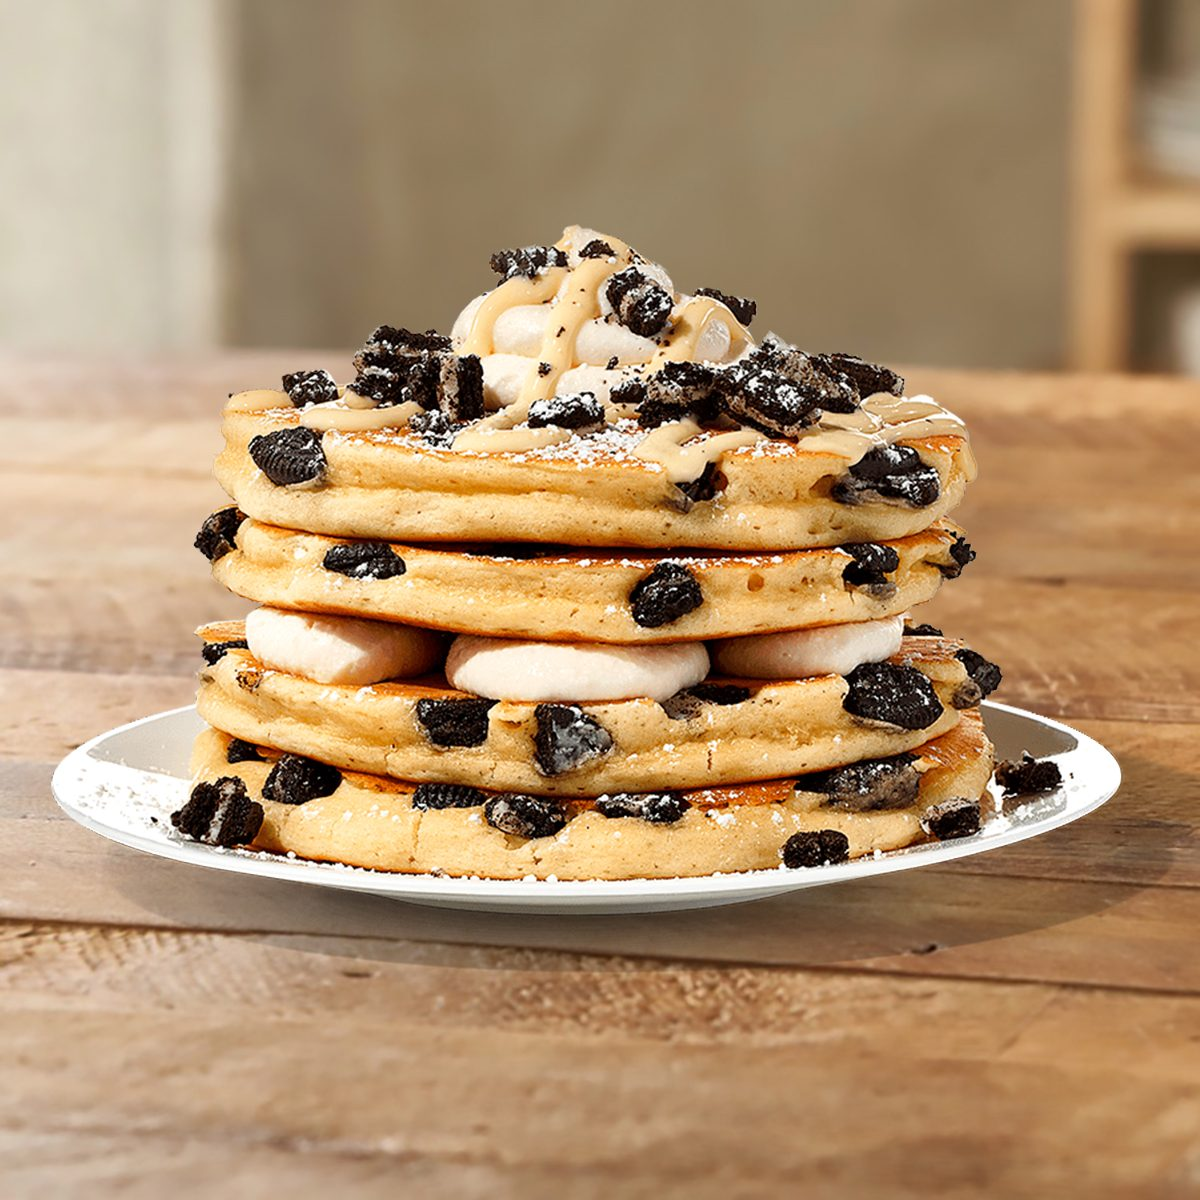 IHOP Cookies and Cream Pancakes